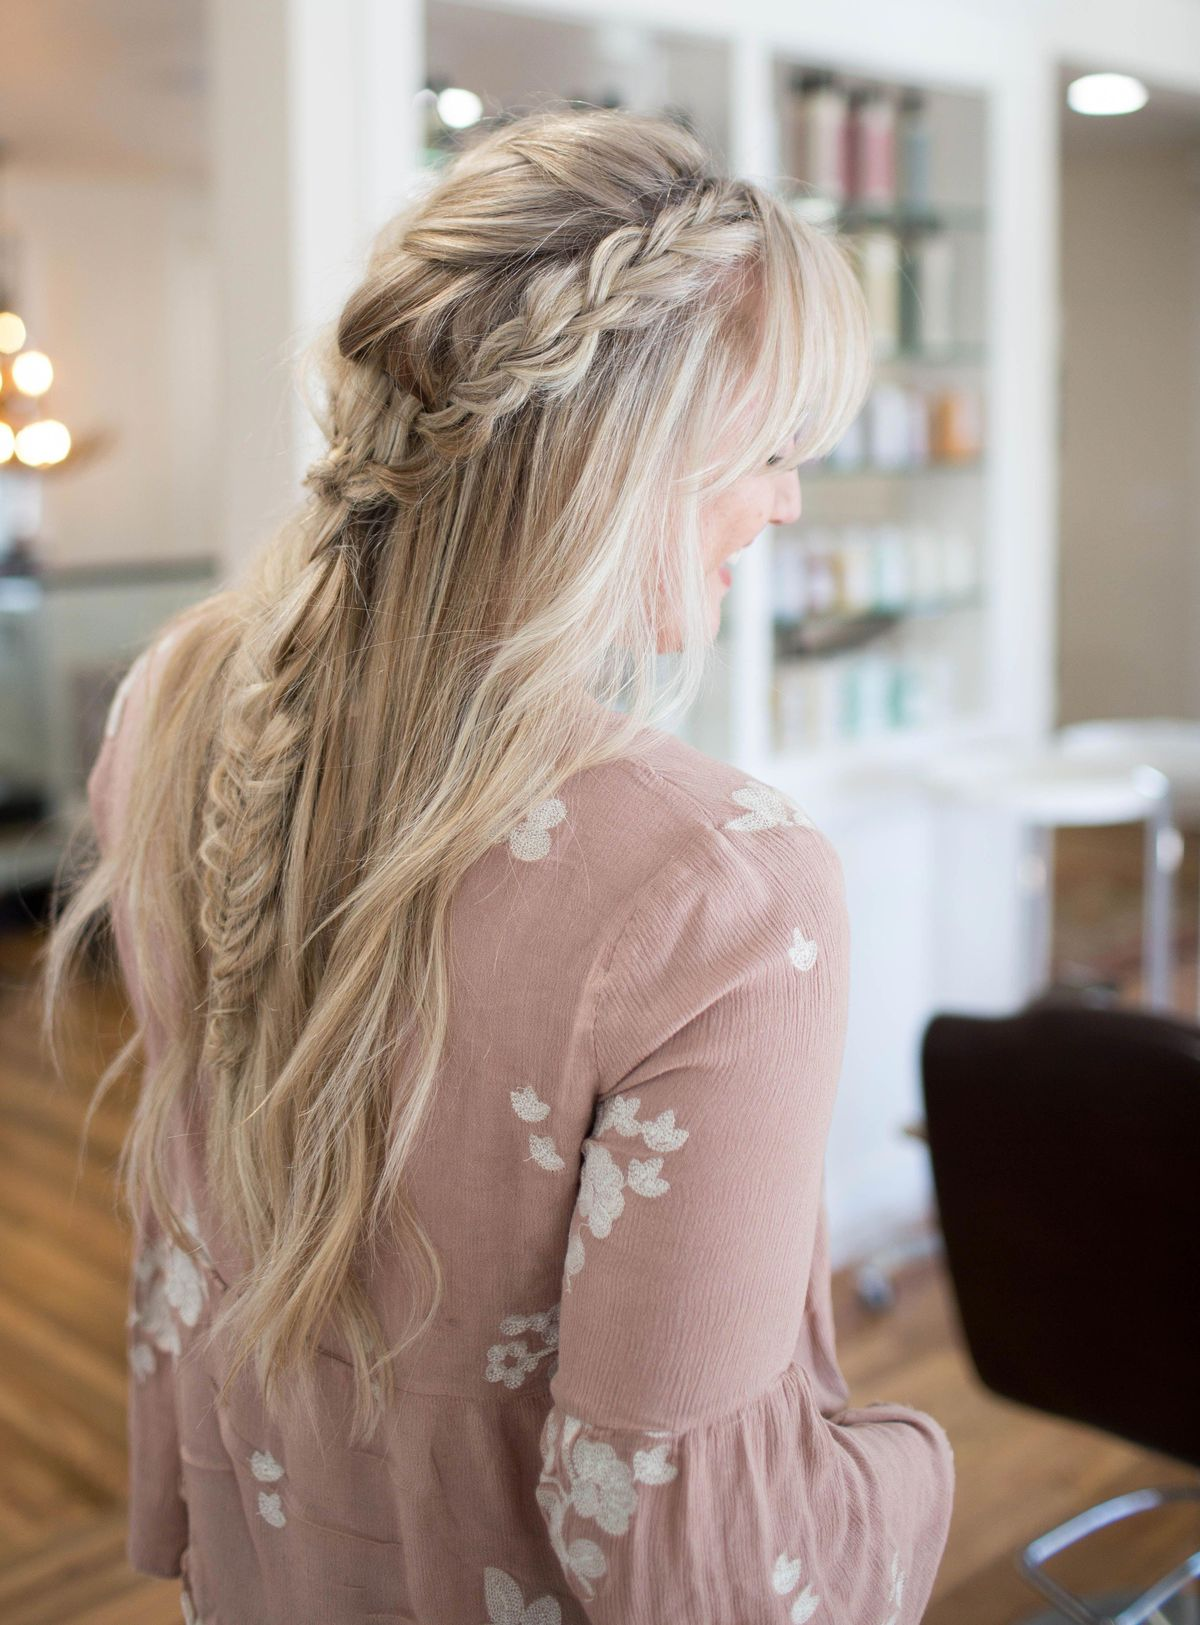 "Hair // Boho Messy Braid Tutorial <a class=""pintag"" href=""/explore/Braidedhairstyles/"" title=""#Braidedhairstyles explore Pinterest"">#Braidedhairstyles</a><p><a href=""http://www.homeinteriordesign.org/2018/02/short-guide-to-interior-decoration.html"">Short guide to interior decoration</a></p>"